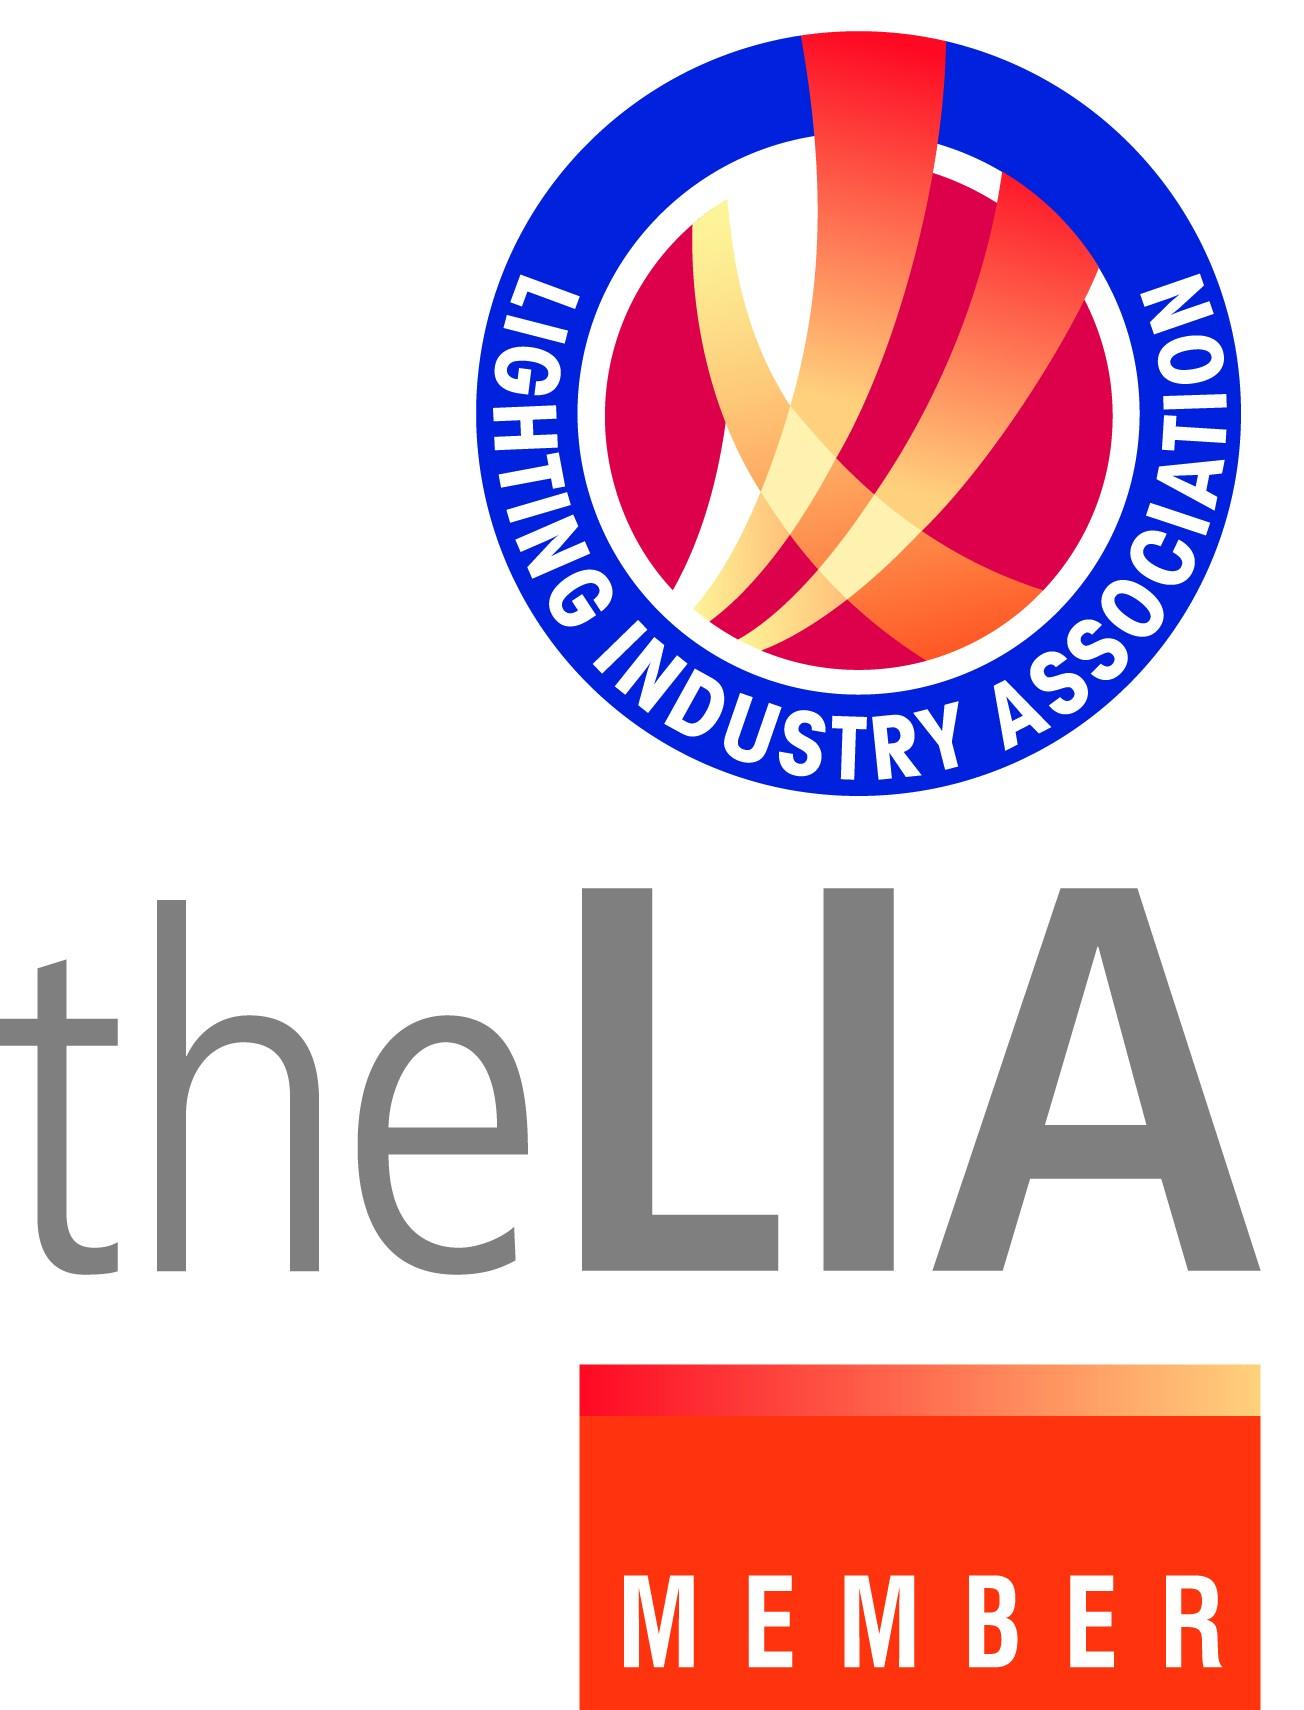 Lighting Industry Assoication - Audit